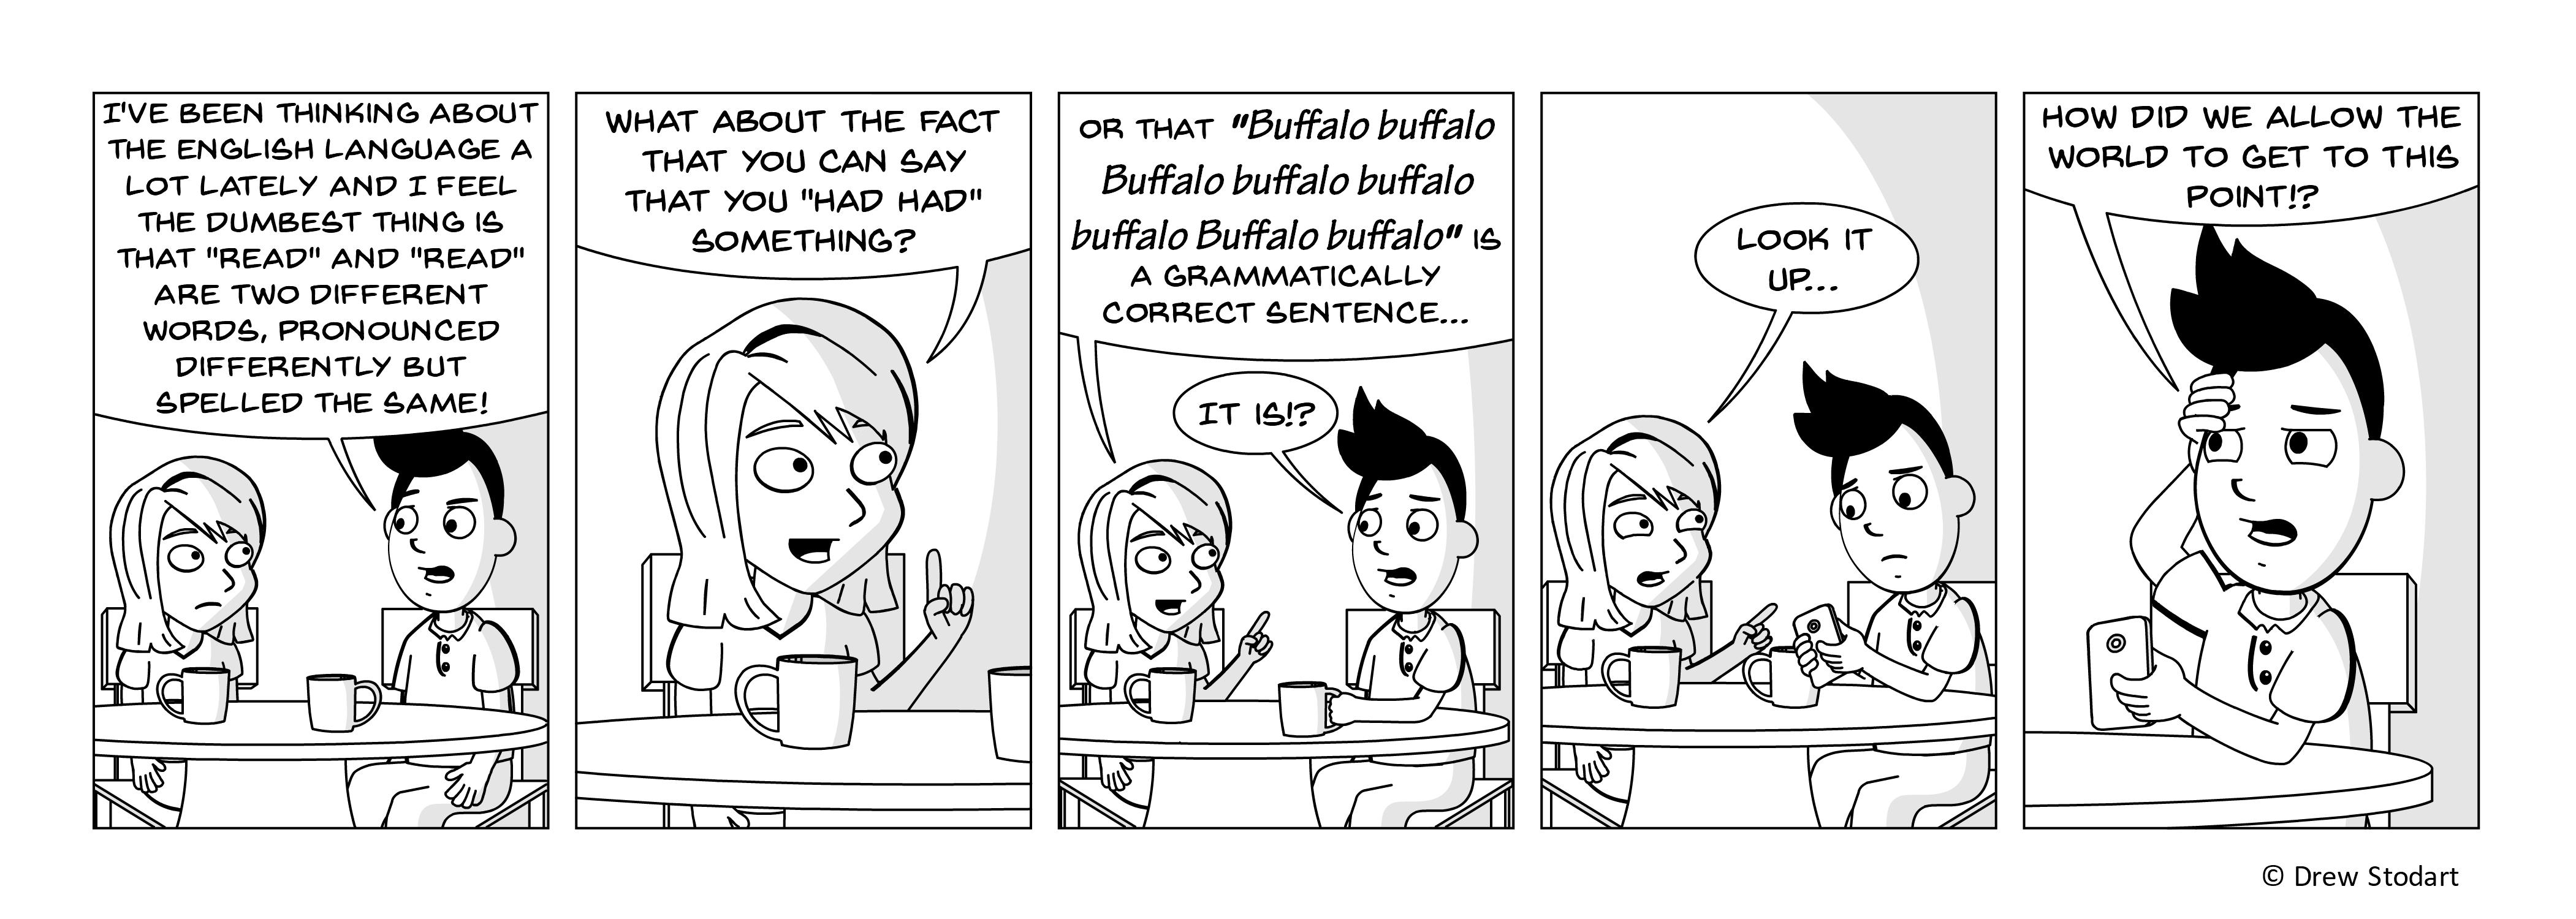 Average Joe 54 – Buffalo buffalo Buffalo buffalo buffalo buffalo Buffalo buffalo